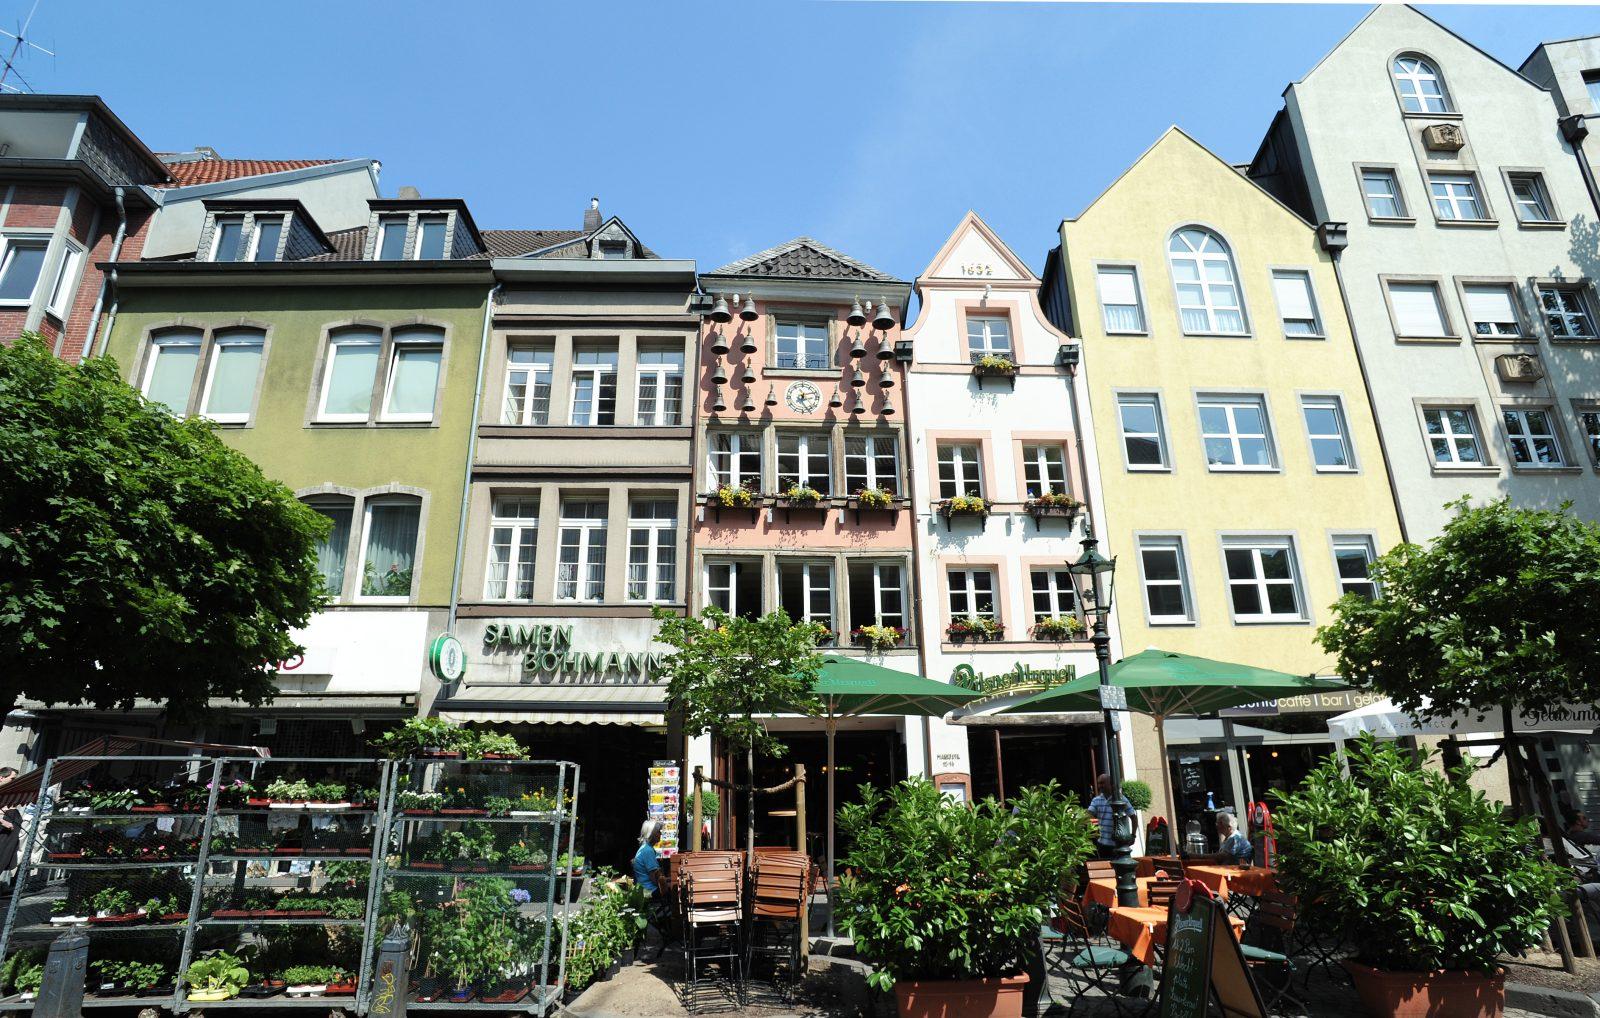 Gevels in binnenstad Dusseldorf